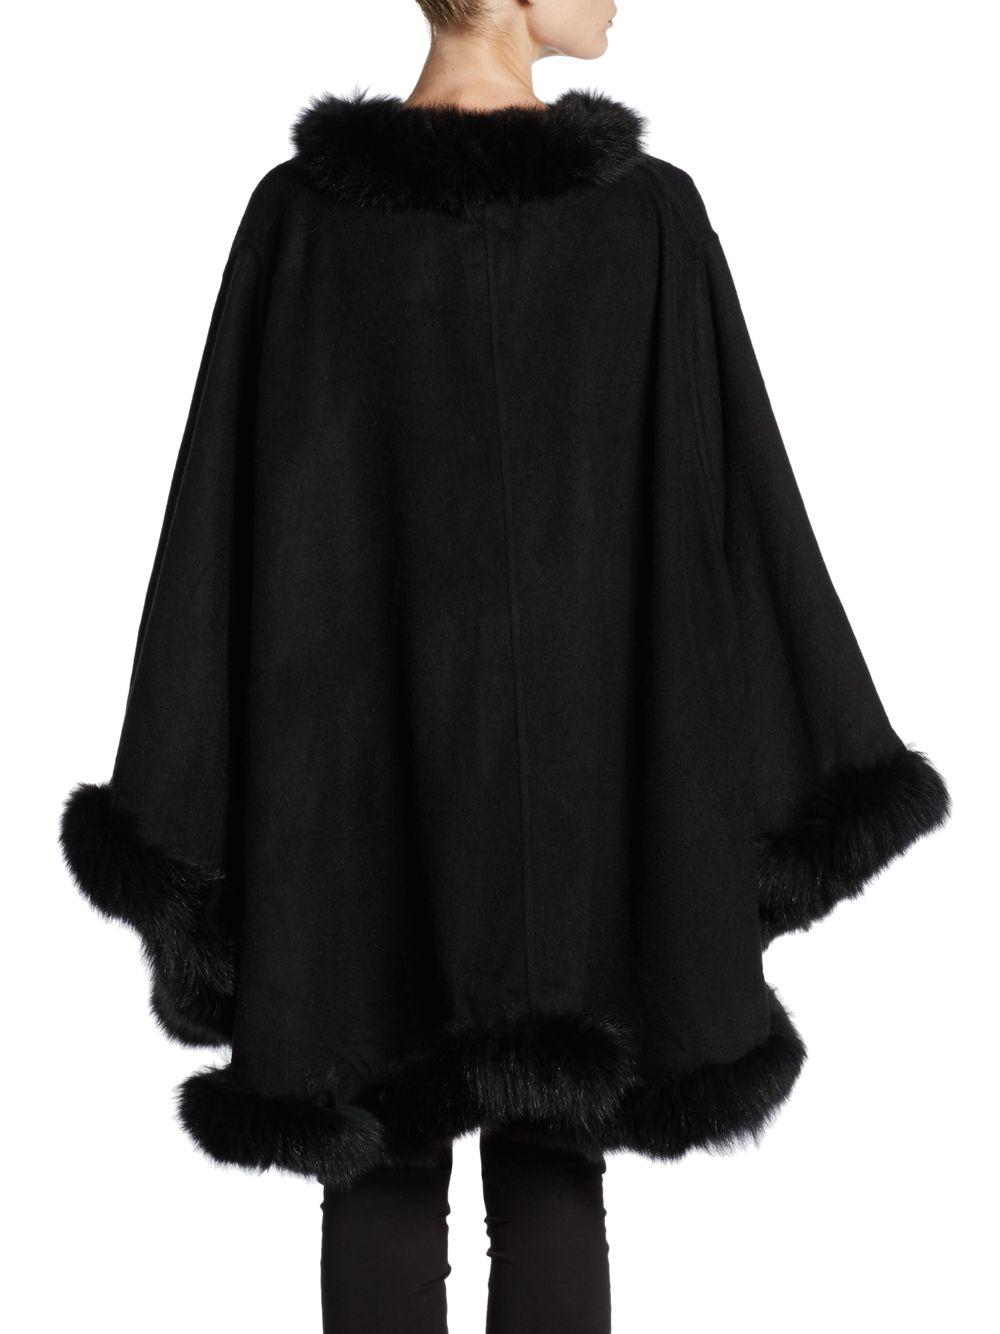 Lyst La Fiorentina Dyed Fox Fur Trimmed Wool Cape In Black